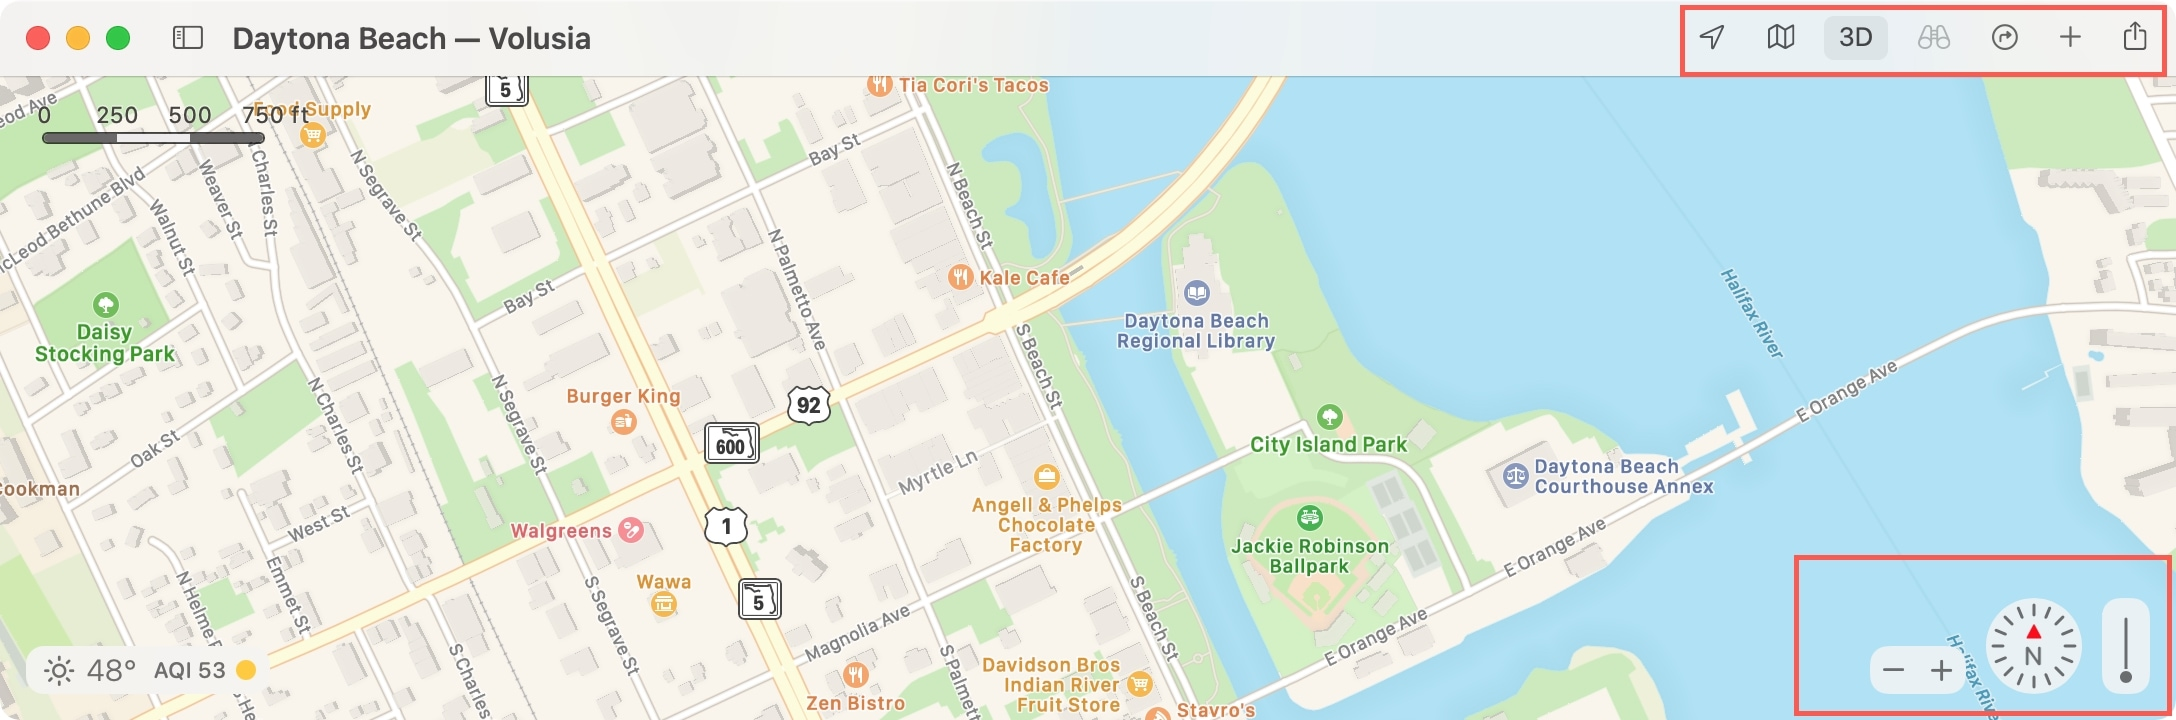 Maps Toolbar and Navigation